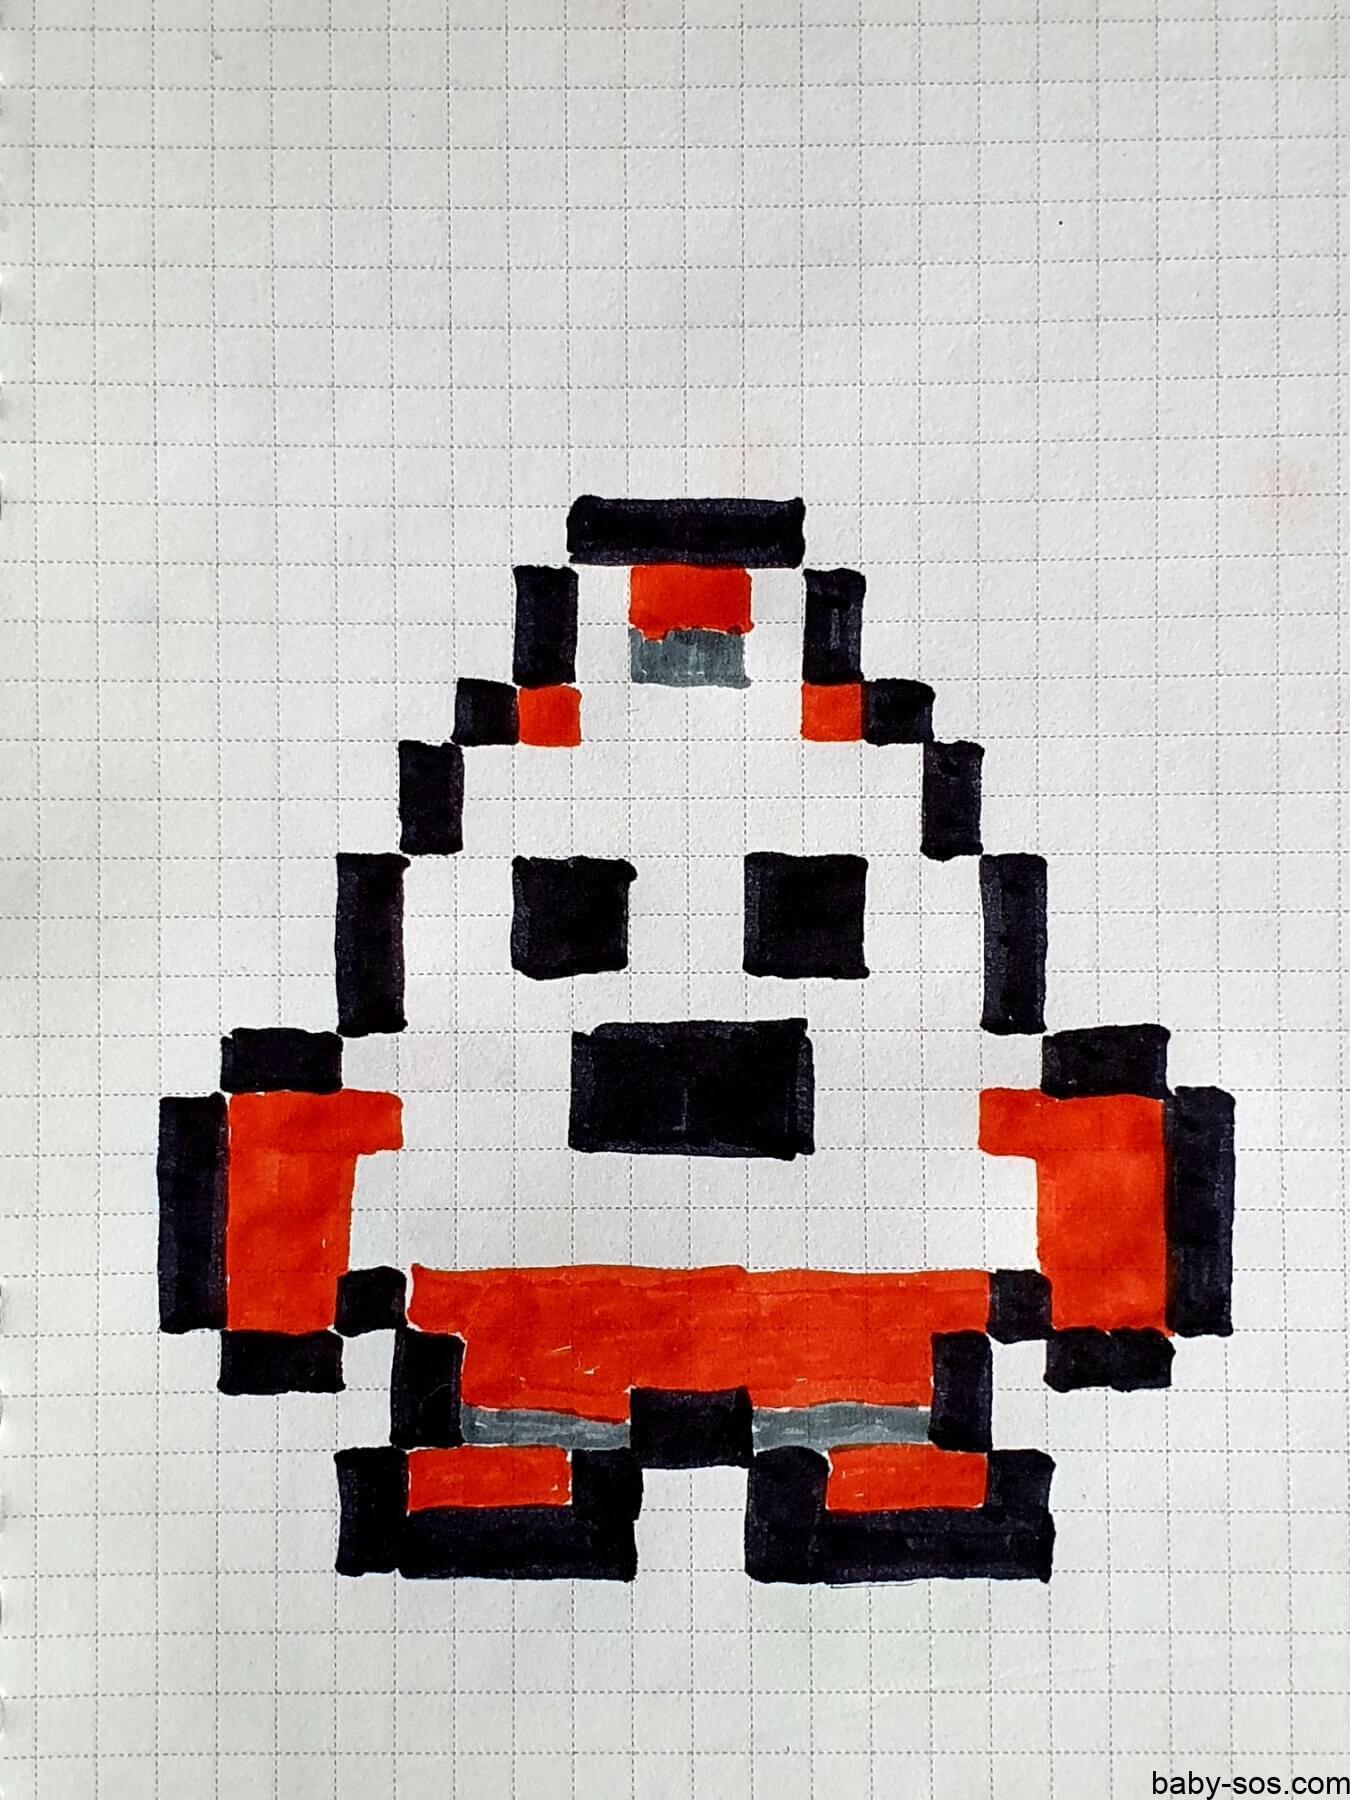 robo spike, brawl stars, малюнки по клiтинкам, рисунки по клеточкам, pixel art, писксельные рисунки